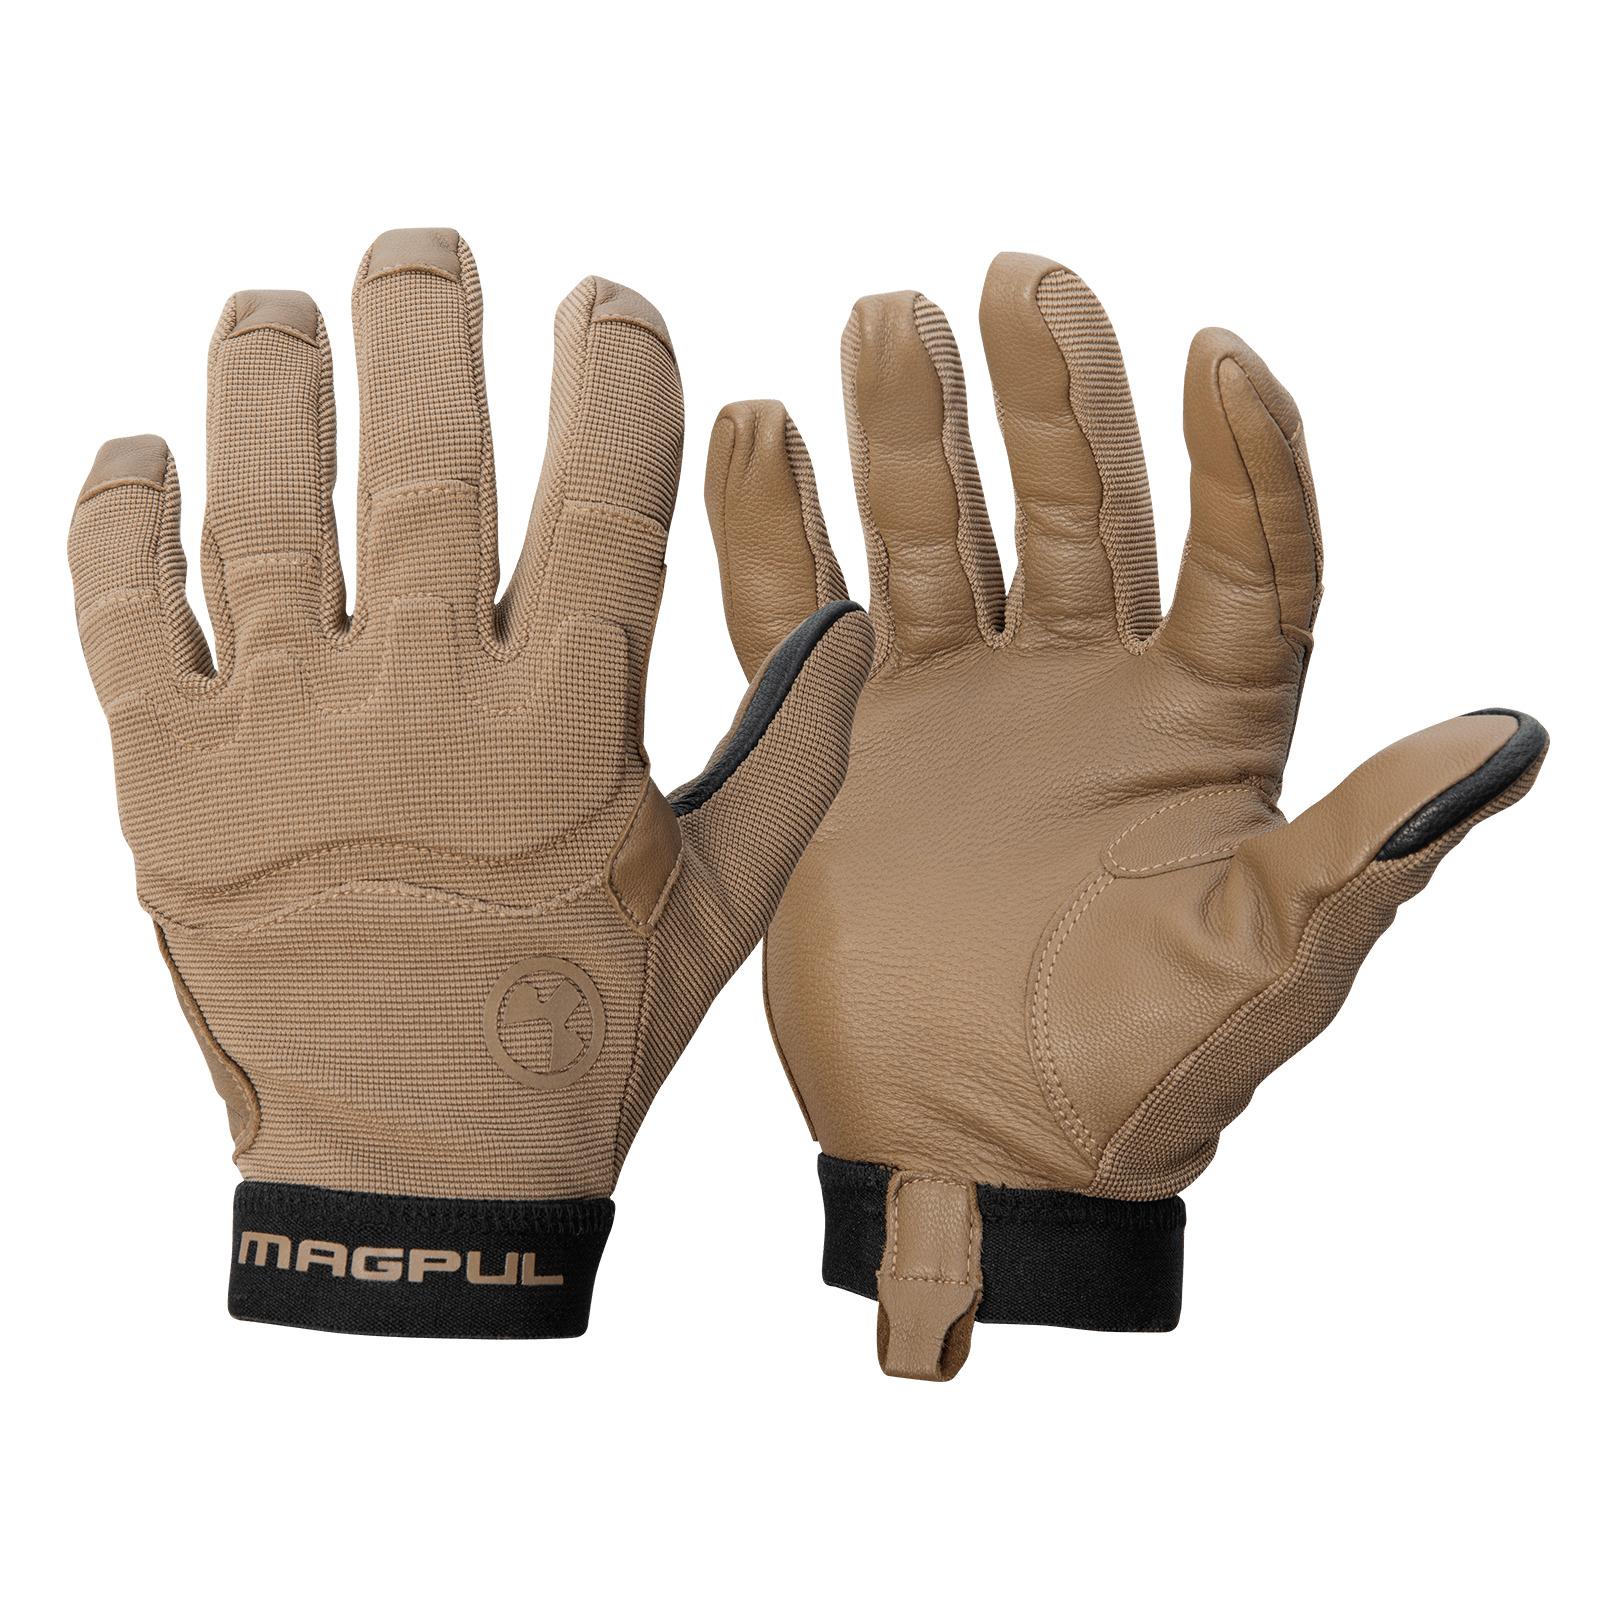 Magpul MAG1015-251 Patrol Glove 2.0 Medium Coyote